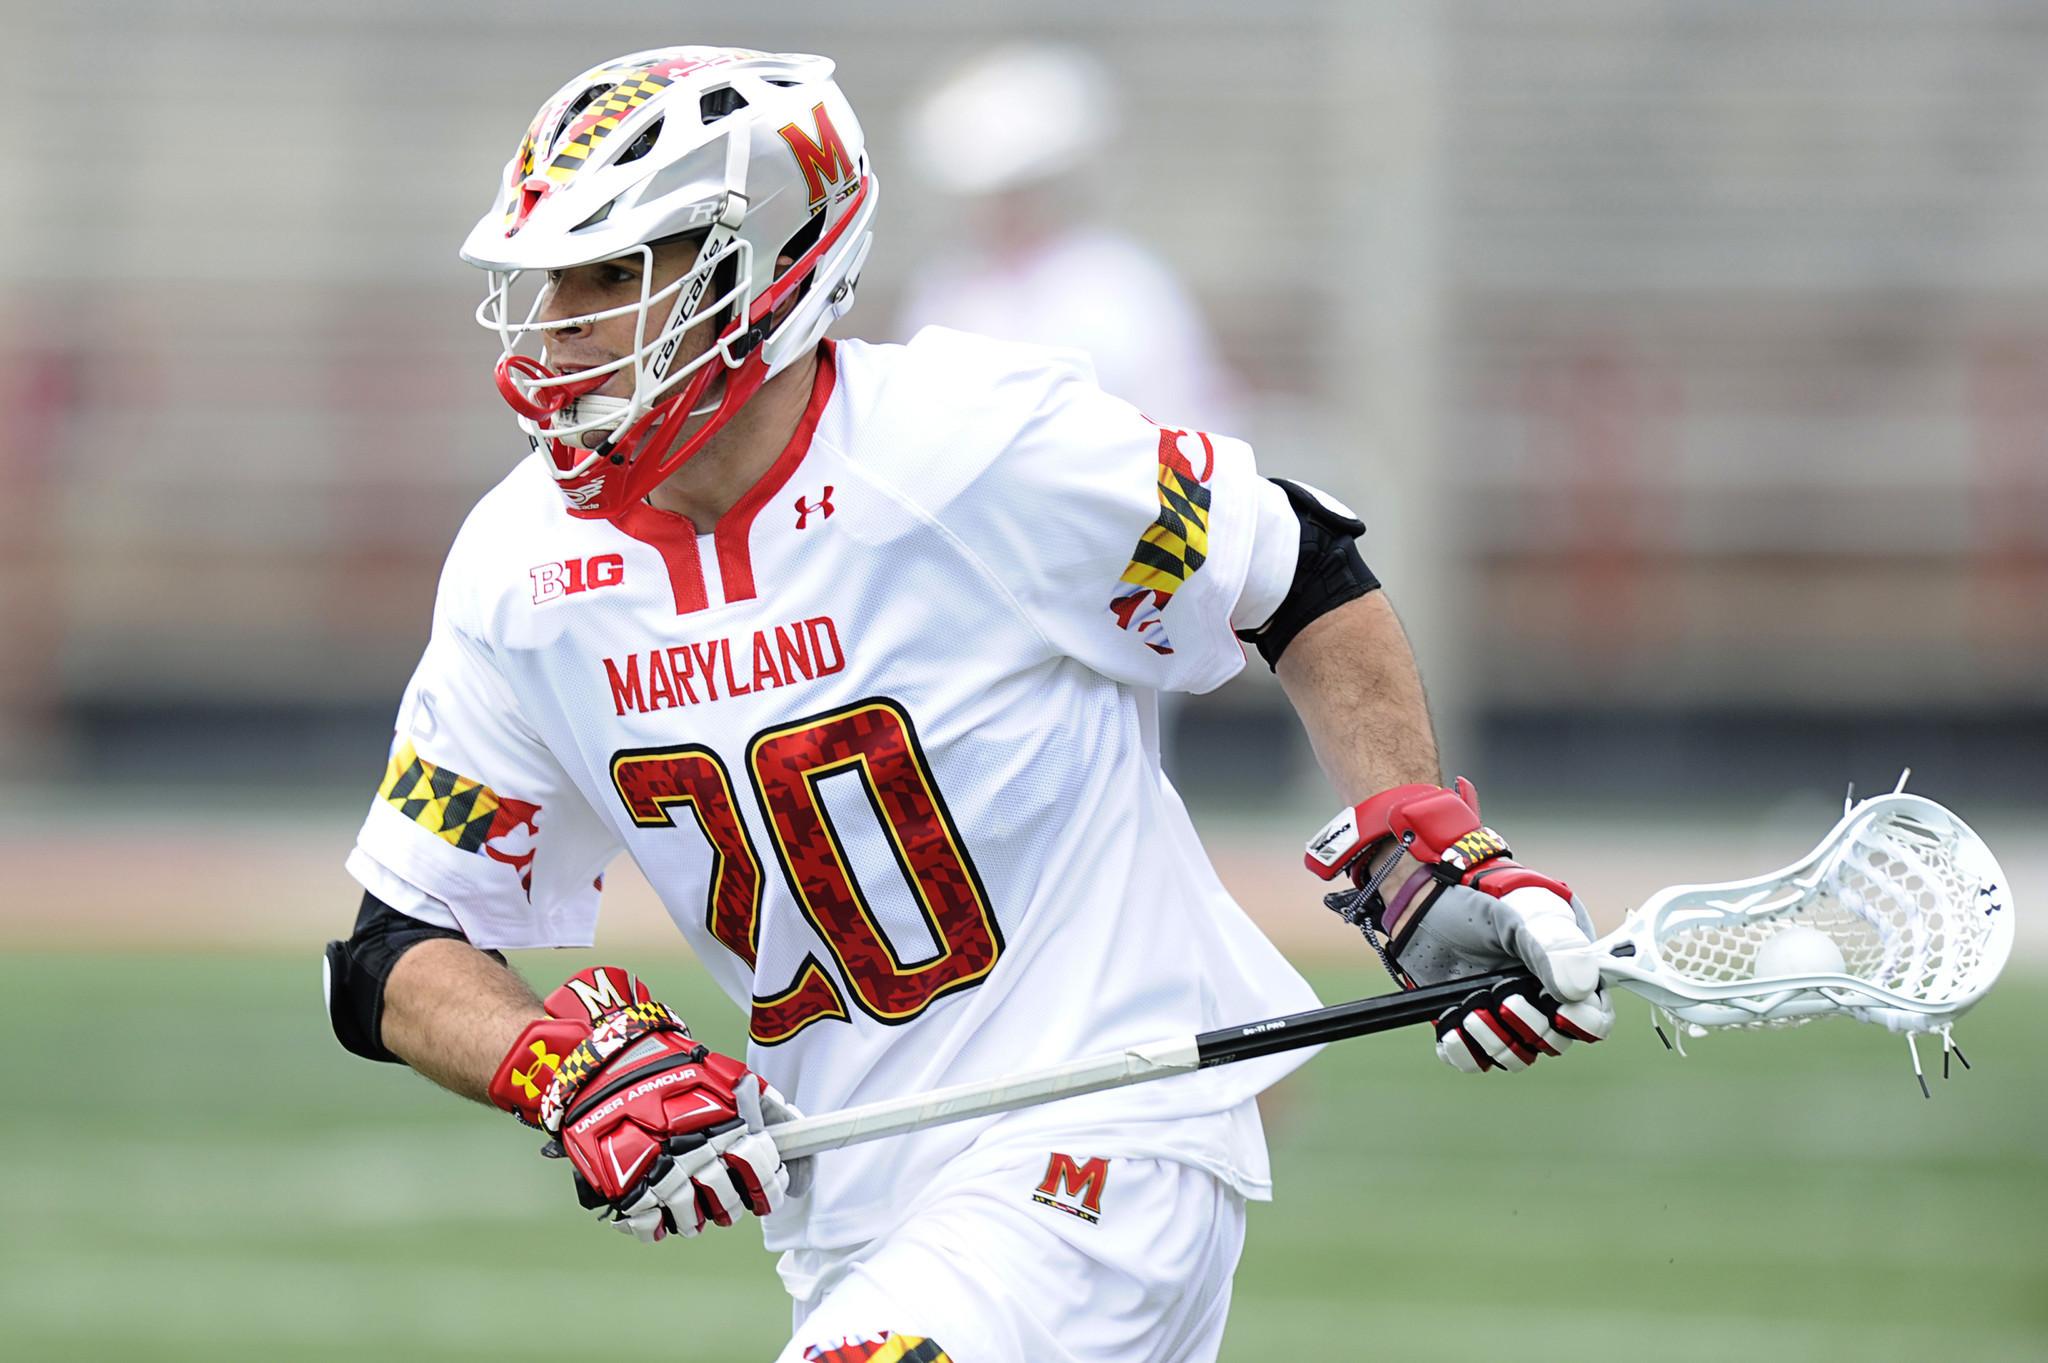 Short-stick defender Nick Manis 'unsung hero' for Maryland ...